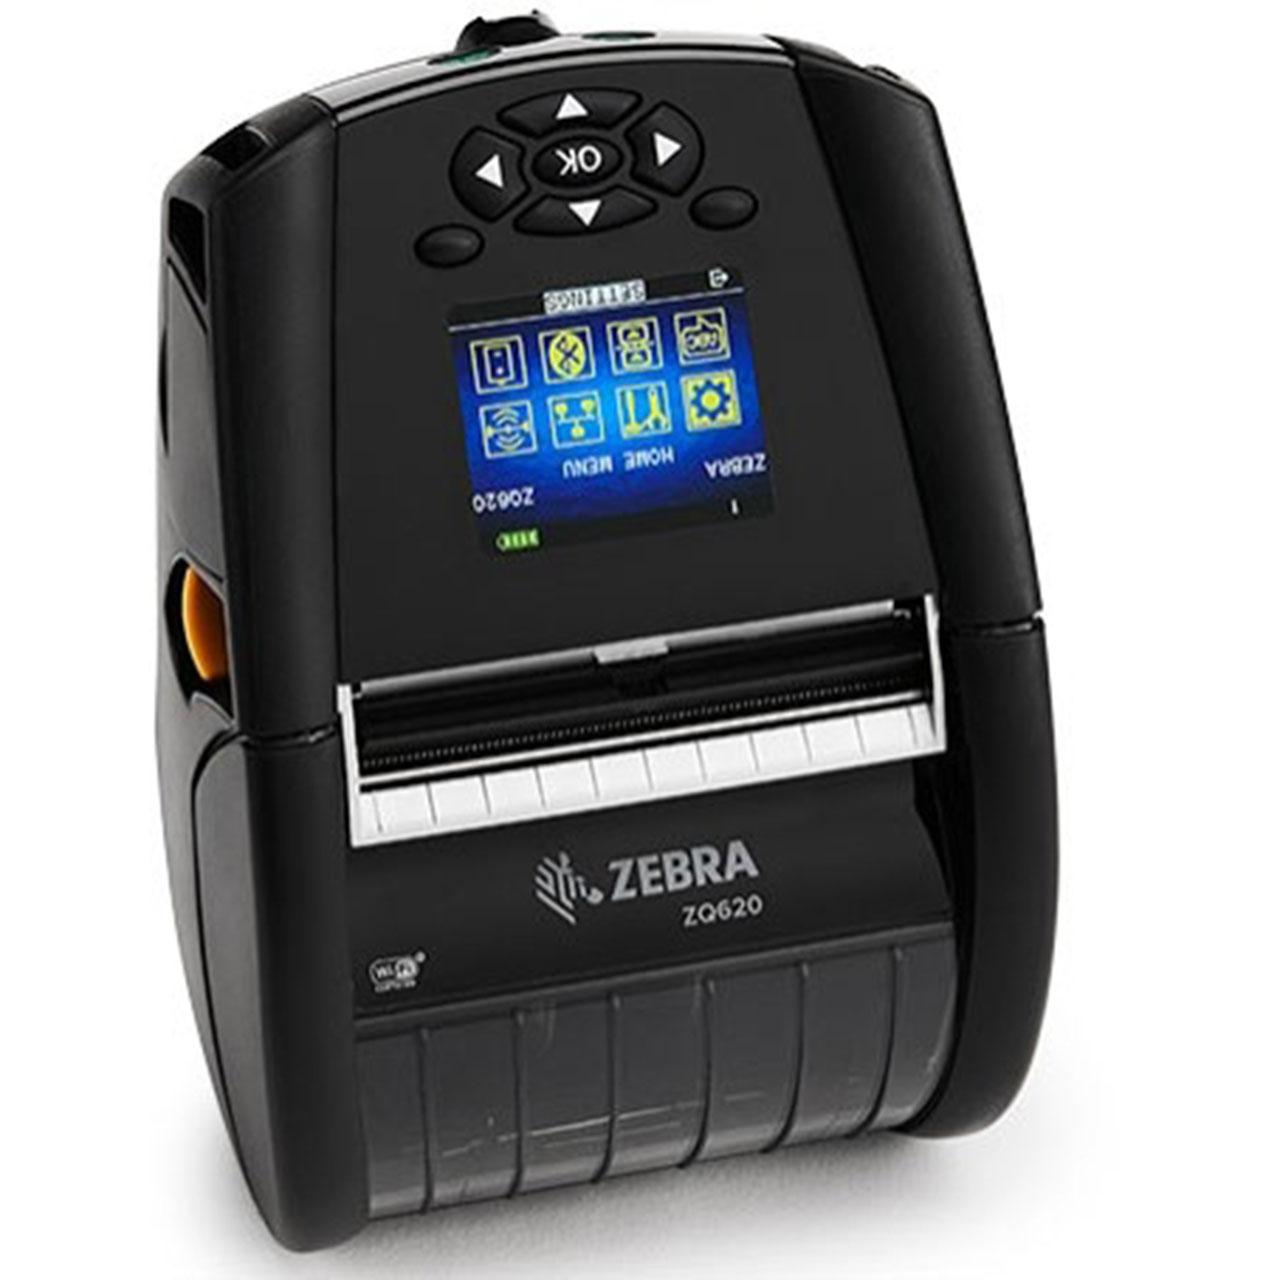 "Термопринтер этикеток Zebra DT Printer ZQ620 3""/72mm; English fonts,Dual 802.11AC / BT4.x, Linered platen, 0.75"" core, Group E, Shoulder strap, Ext Battery, Media Width Sen"